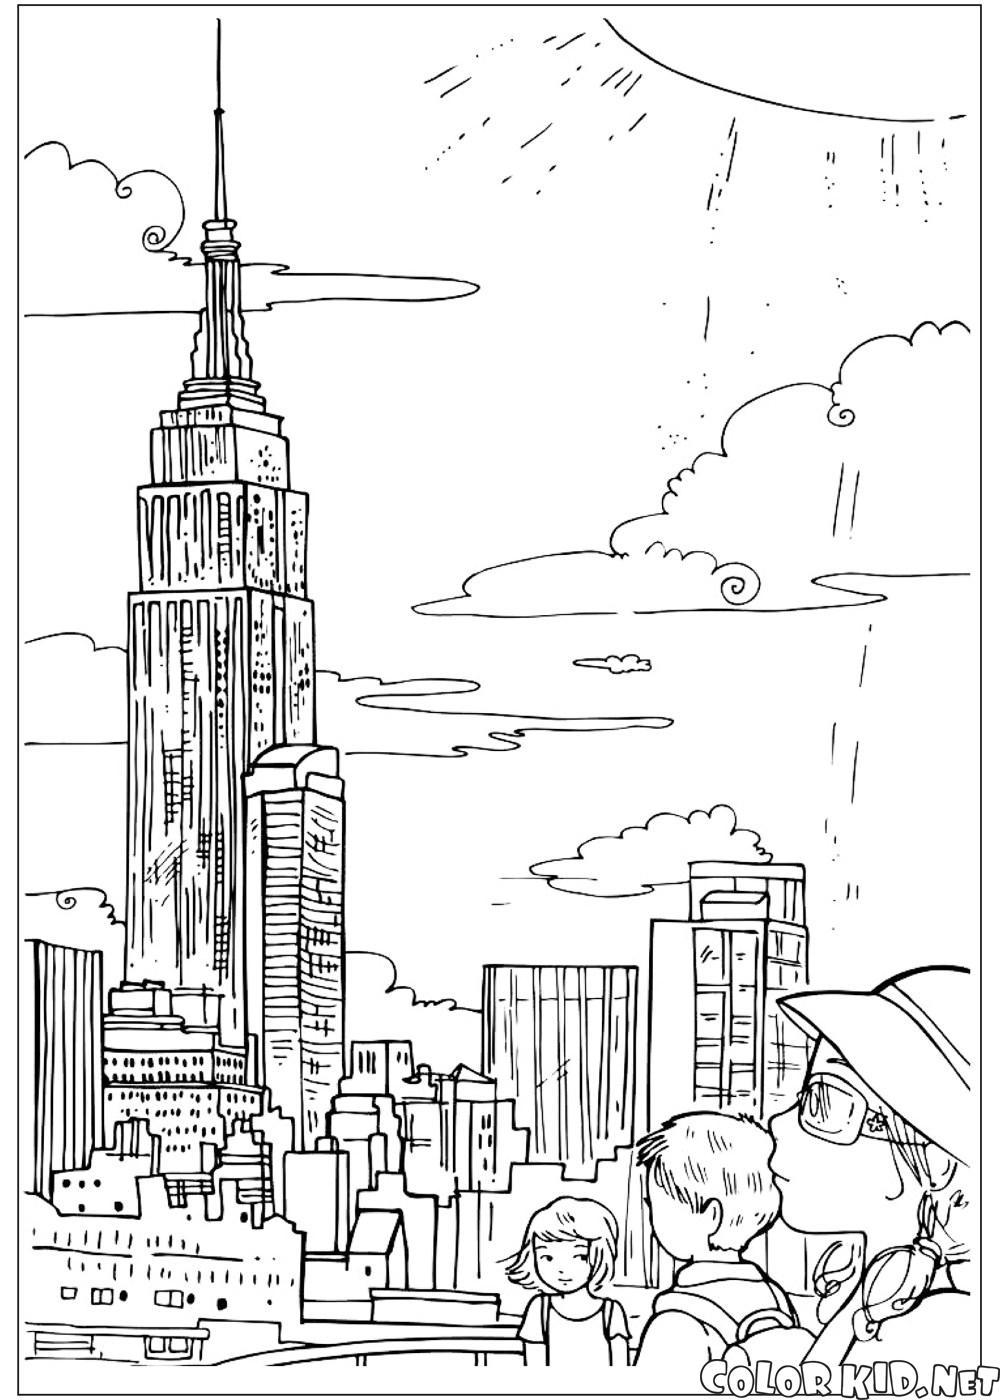 Dibujo para colorear - Estados Unidos de América